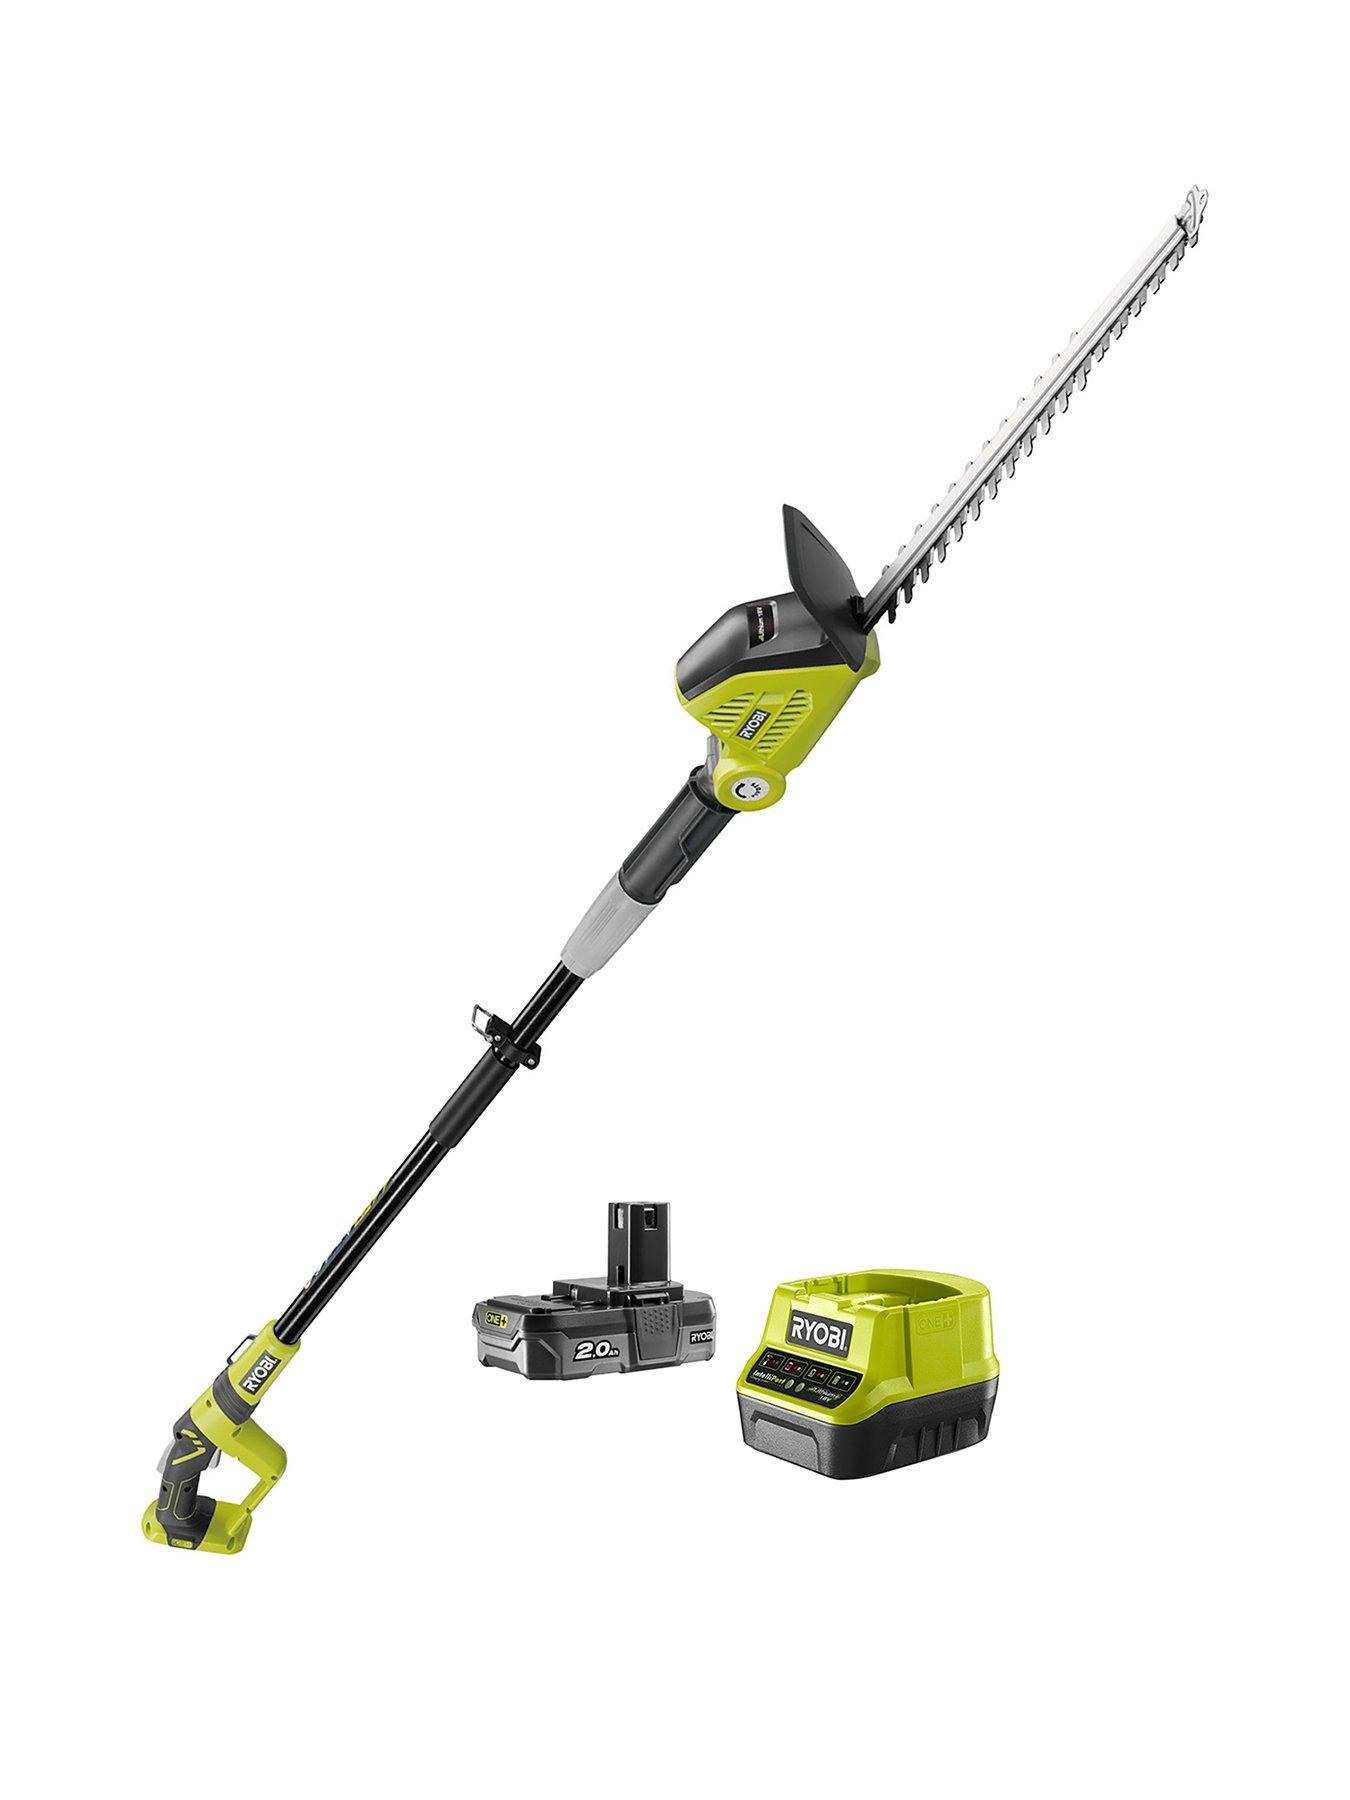 30/cm Cutting Width, 600/W Ryobi rlt6130/Battery-Charged Hedge Trimmer